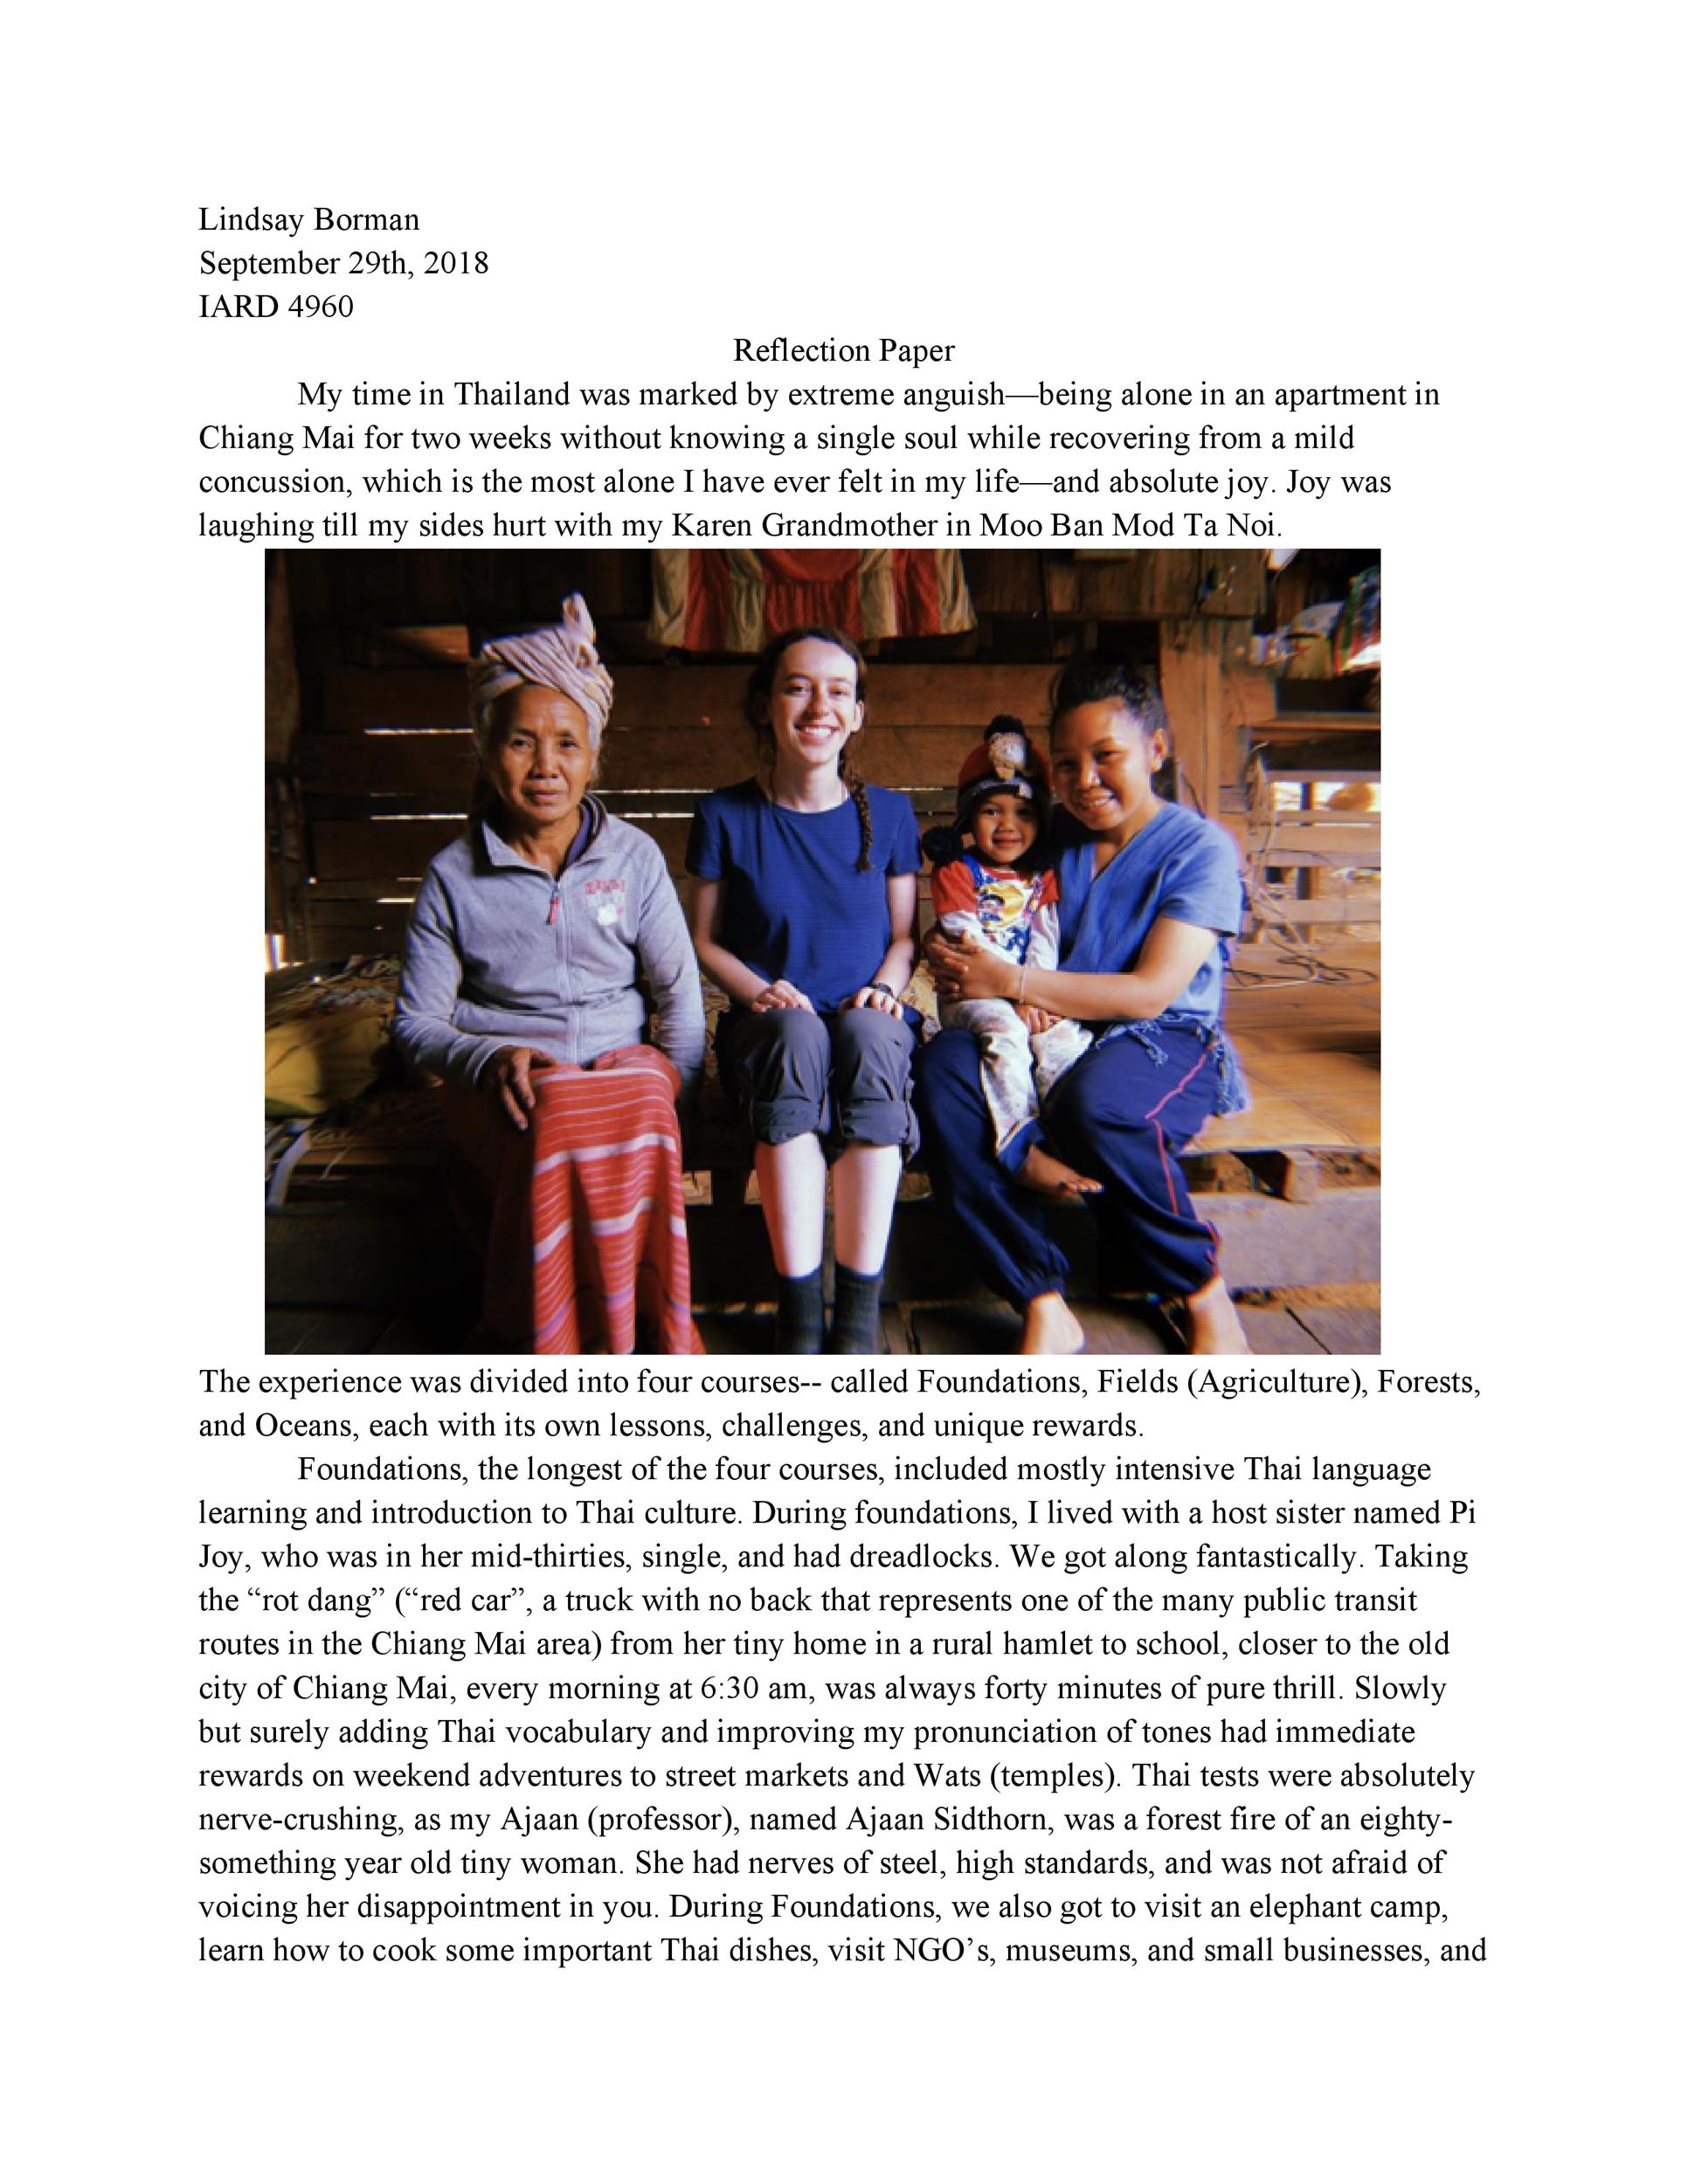 Free reflective essay example 17